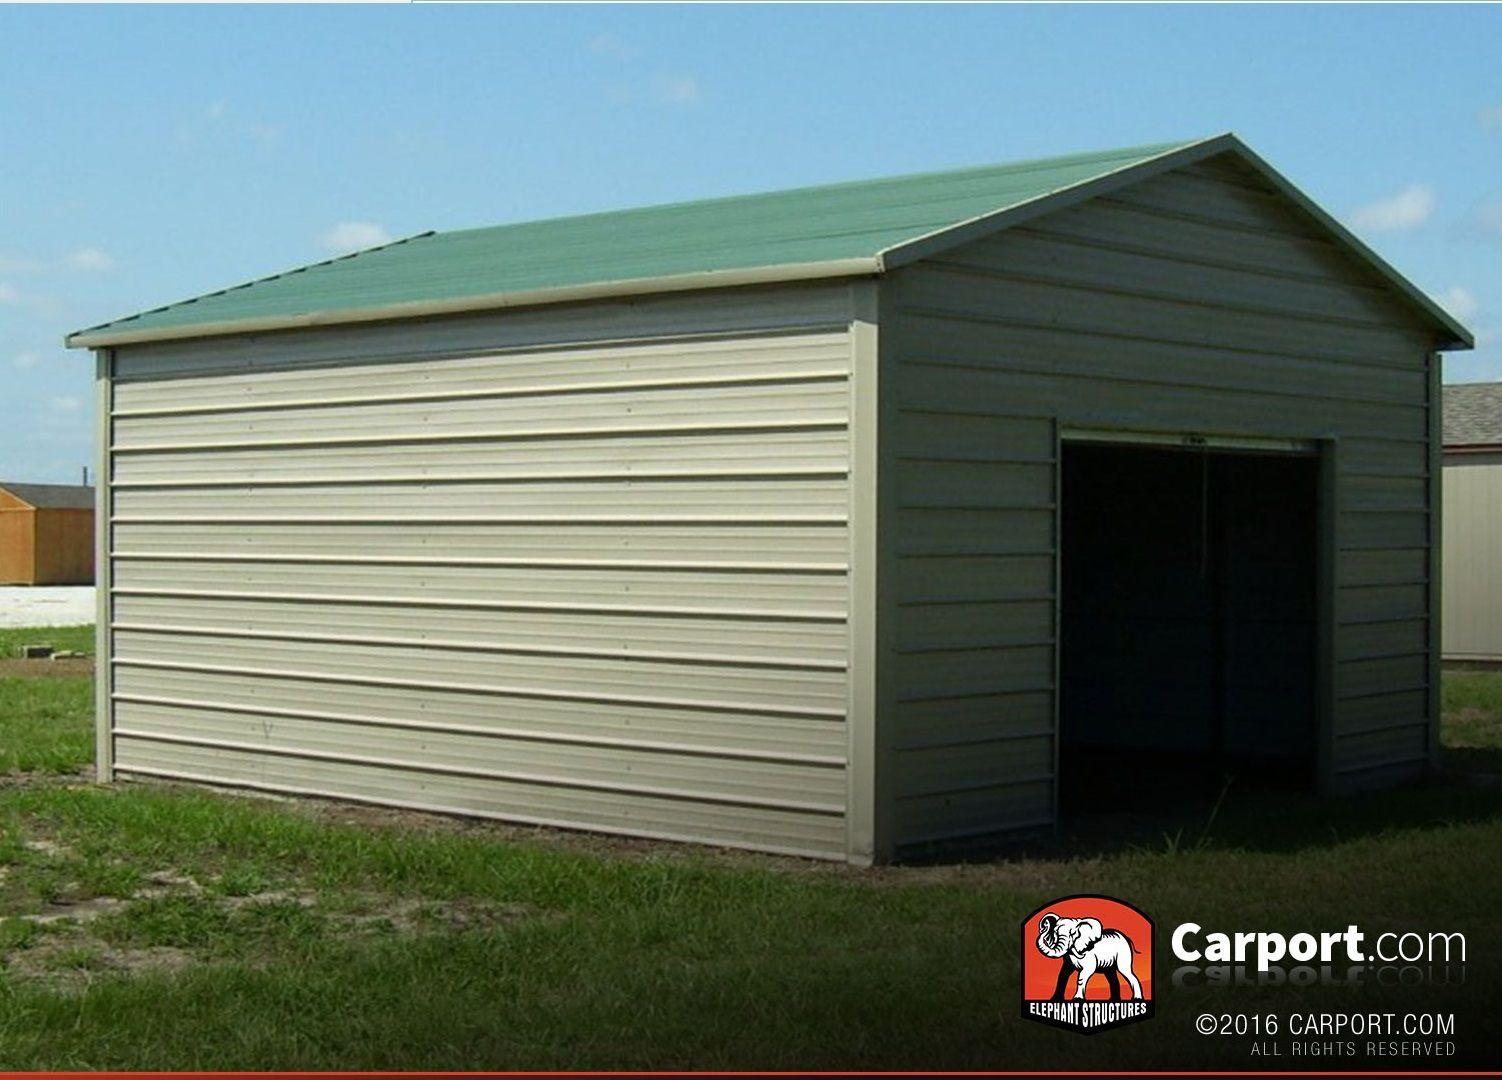 Metal Garage 12 X 21 With Boxed Eave Roof Metal Garages Metal Carport Kits Roofing